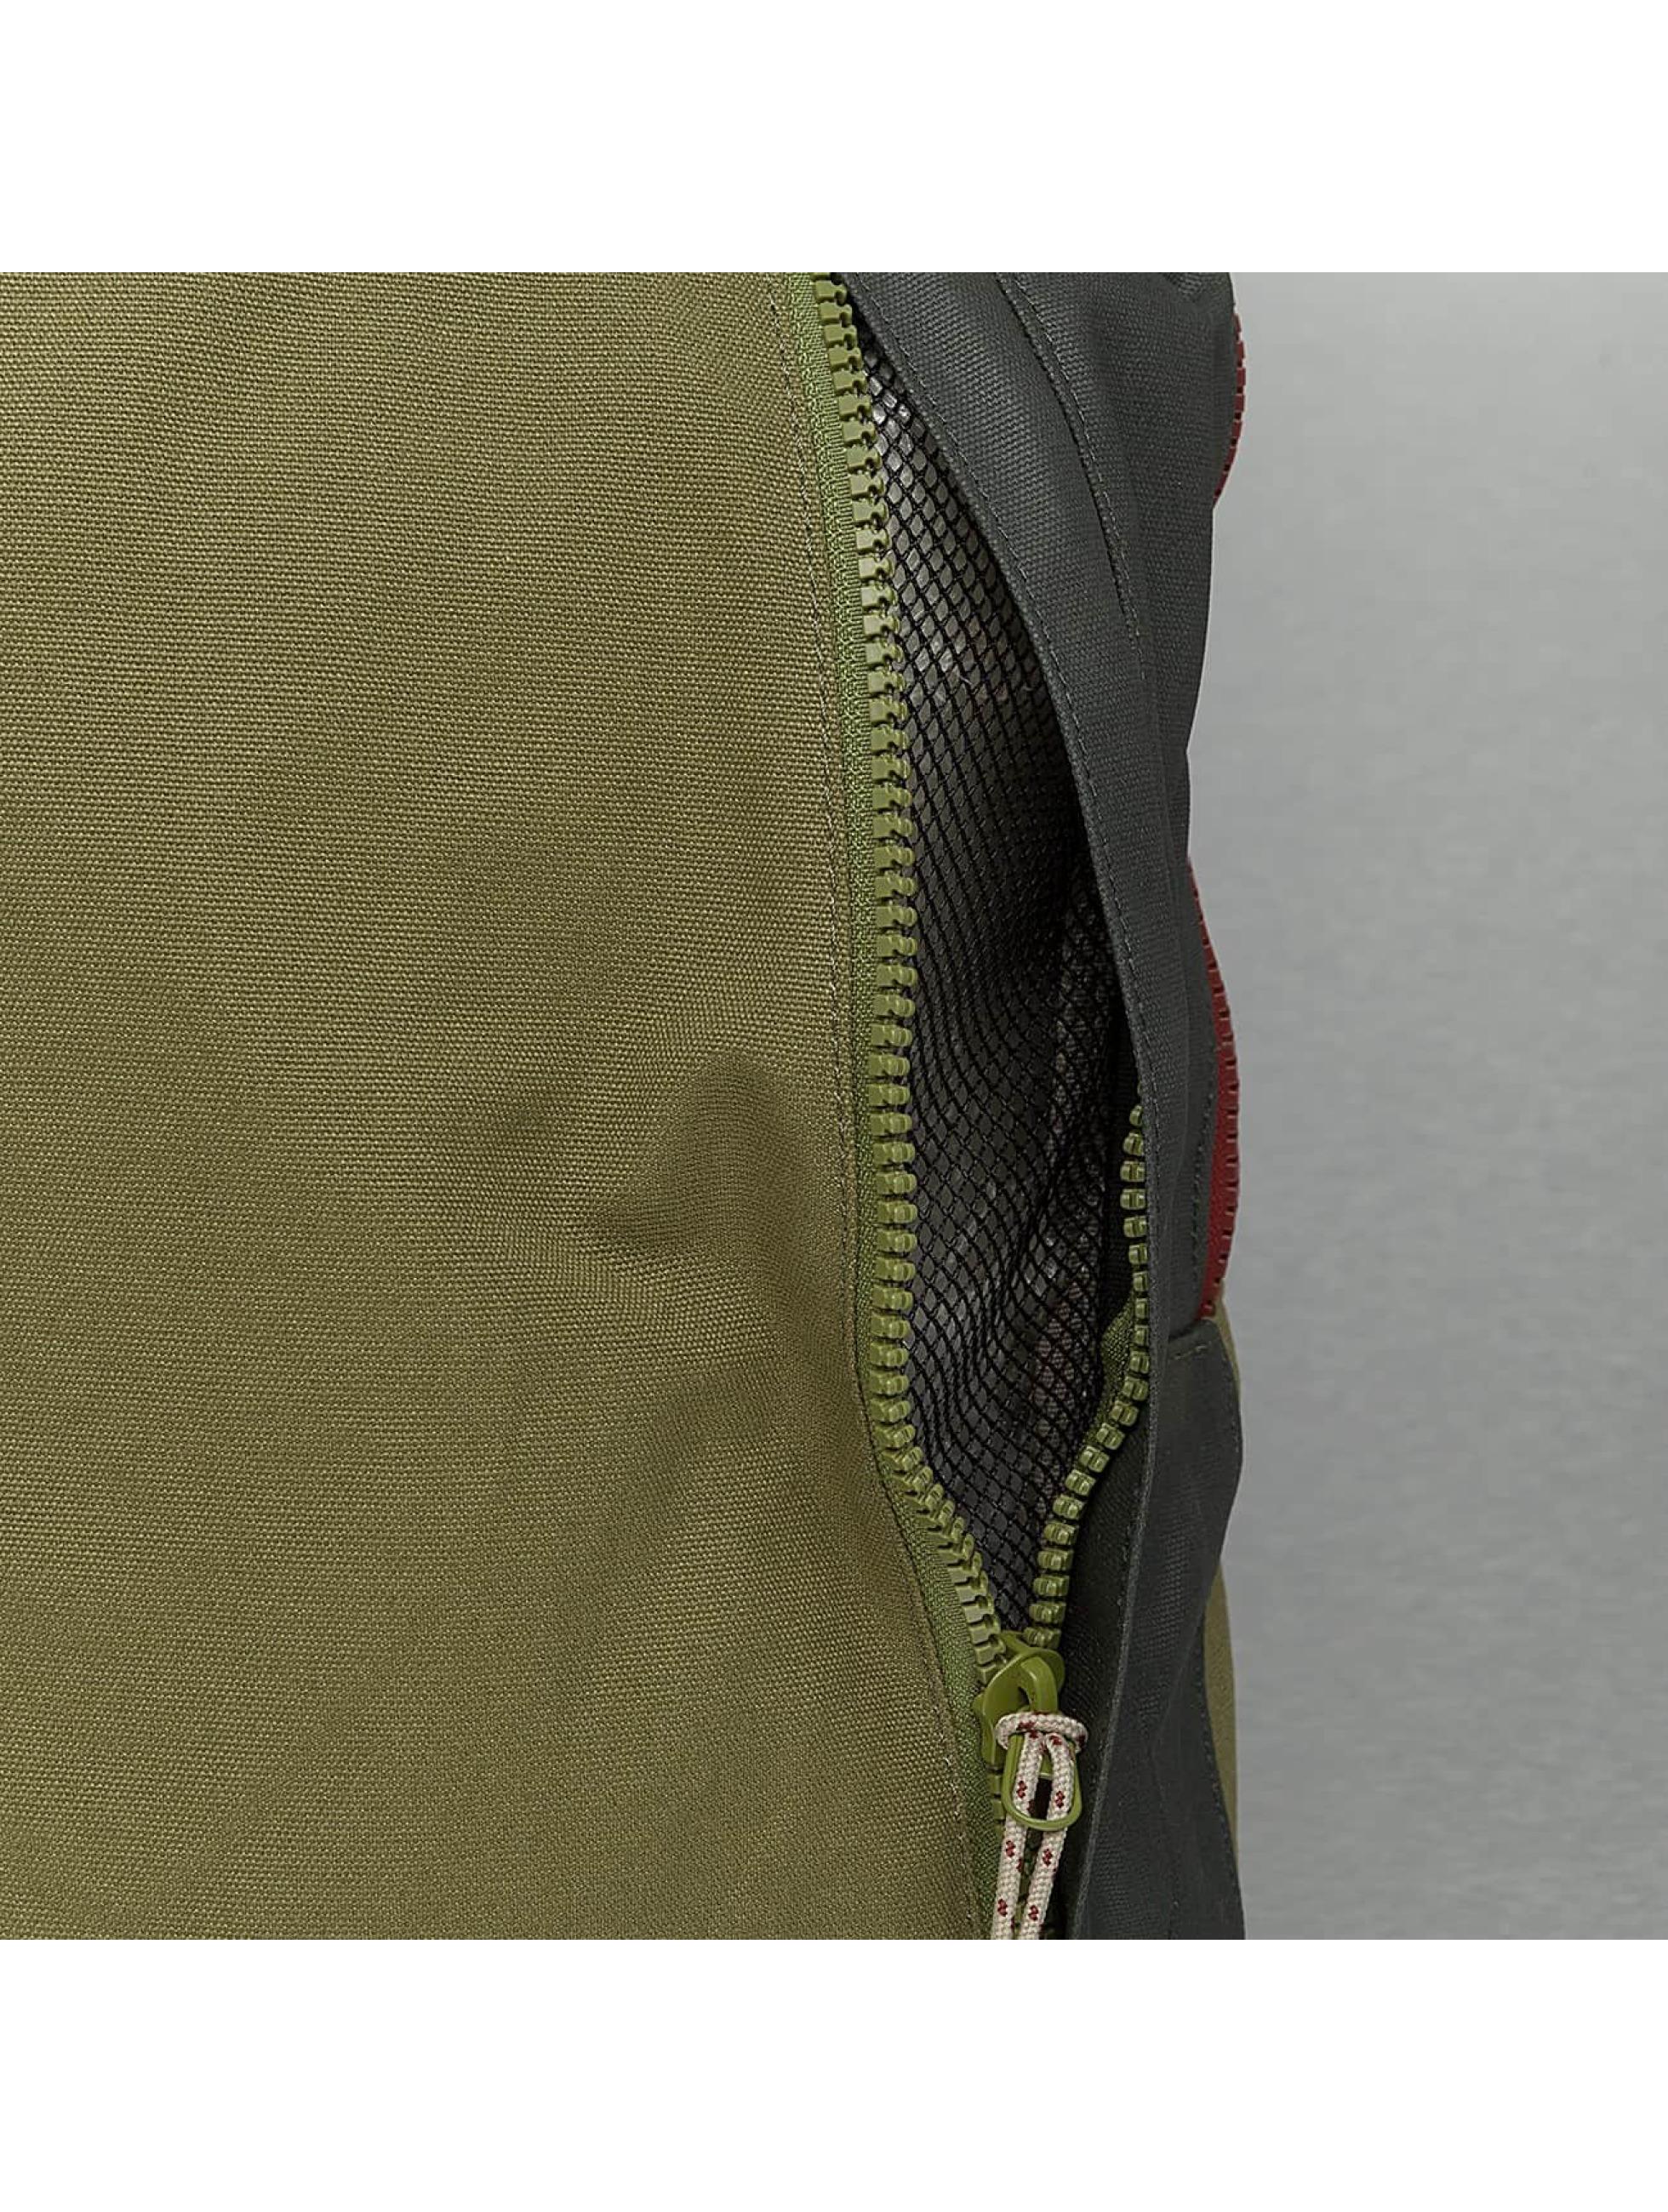 Electric Backpack FLINT green